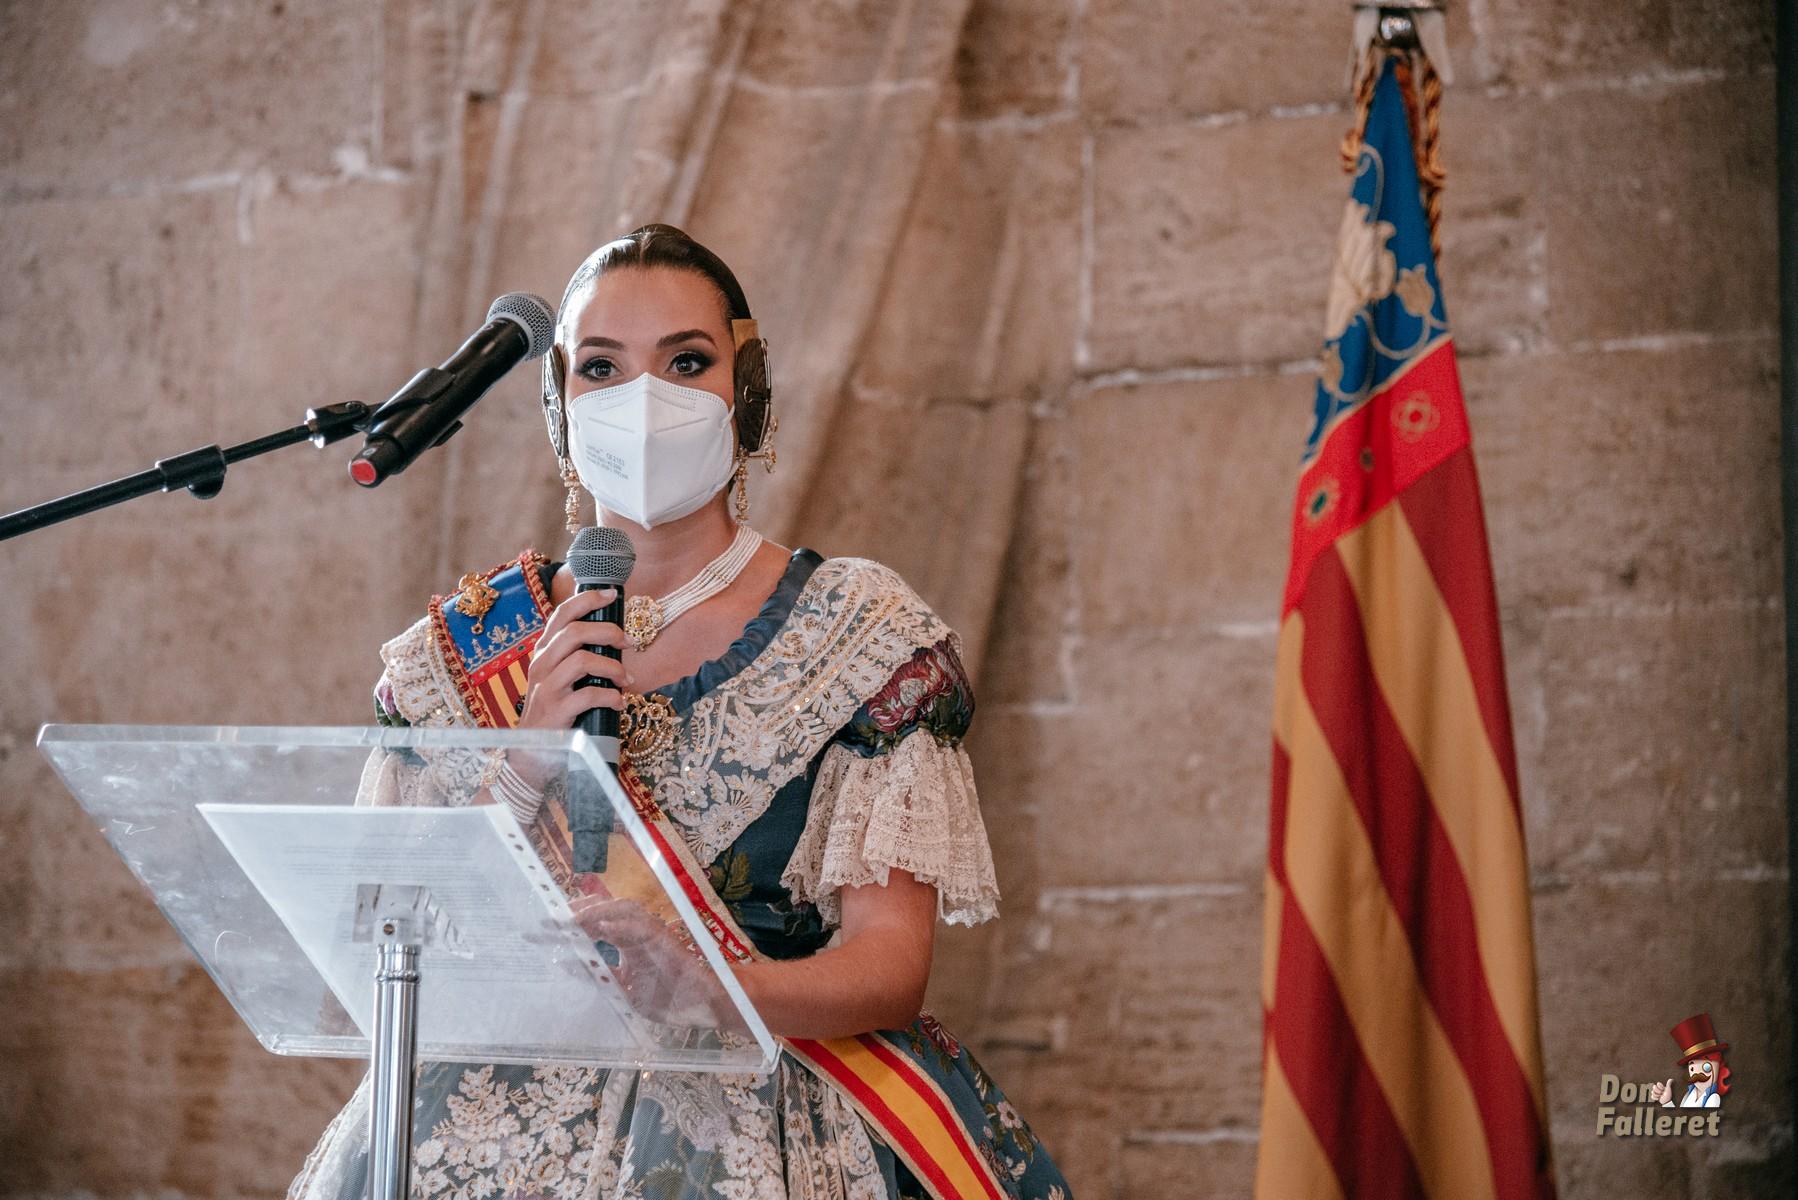 Momento del agradecimiento de Consuelo Llobell. Foto: Fran Adlert/Don Falleret